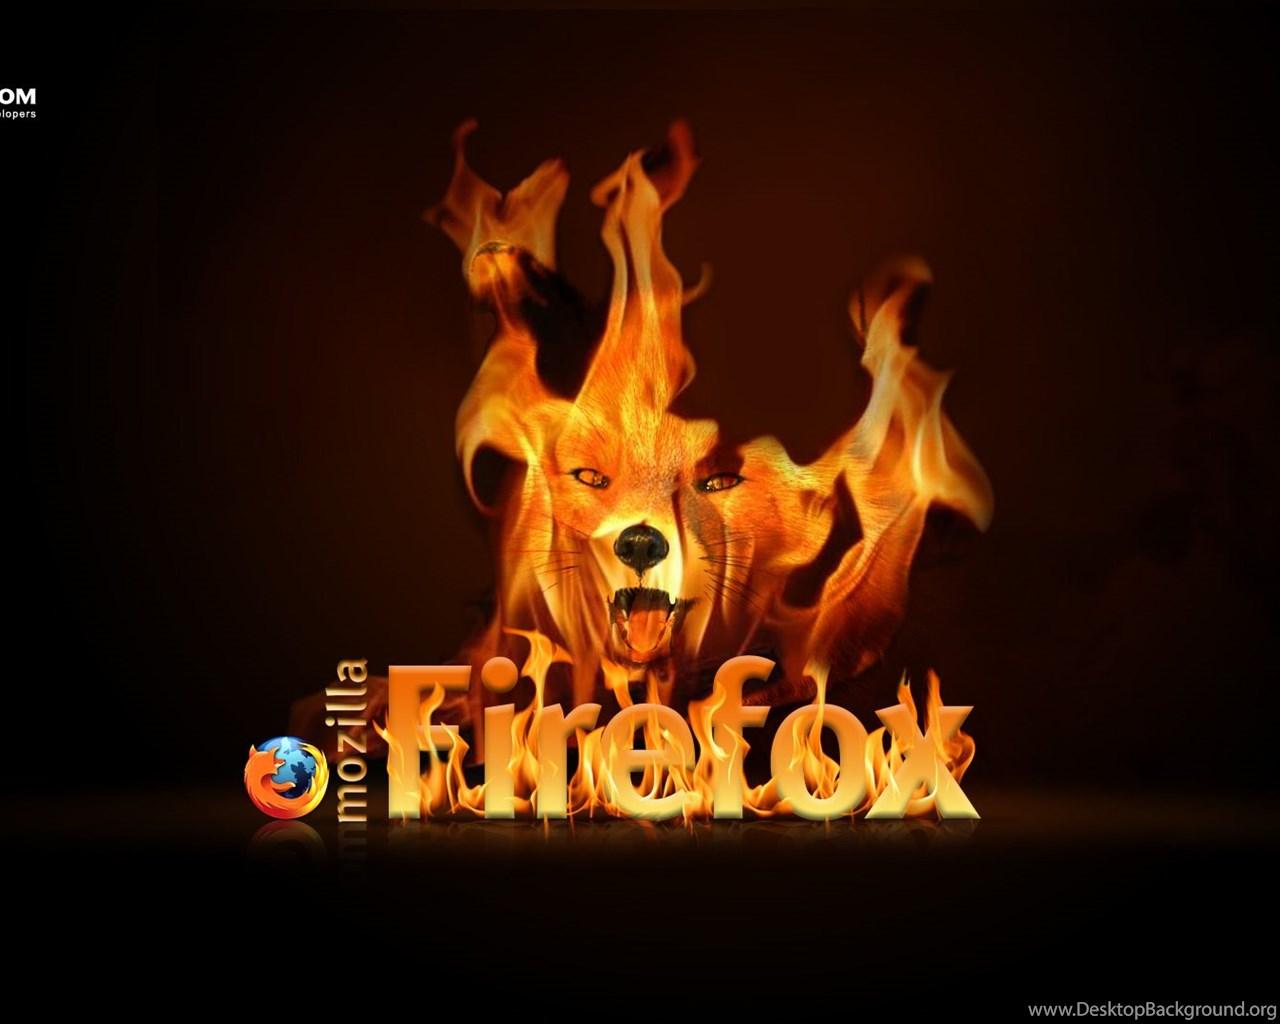 Latest Mozilla Firefox Wallpapers For Windows 8 @webgranth